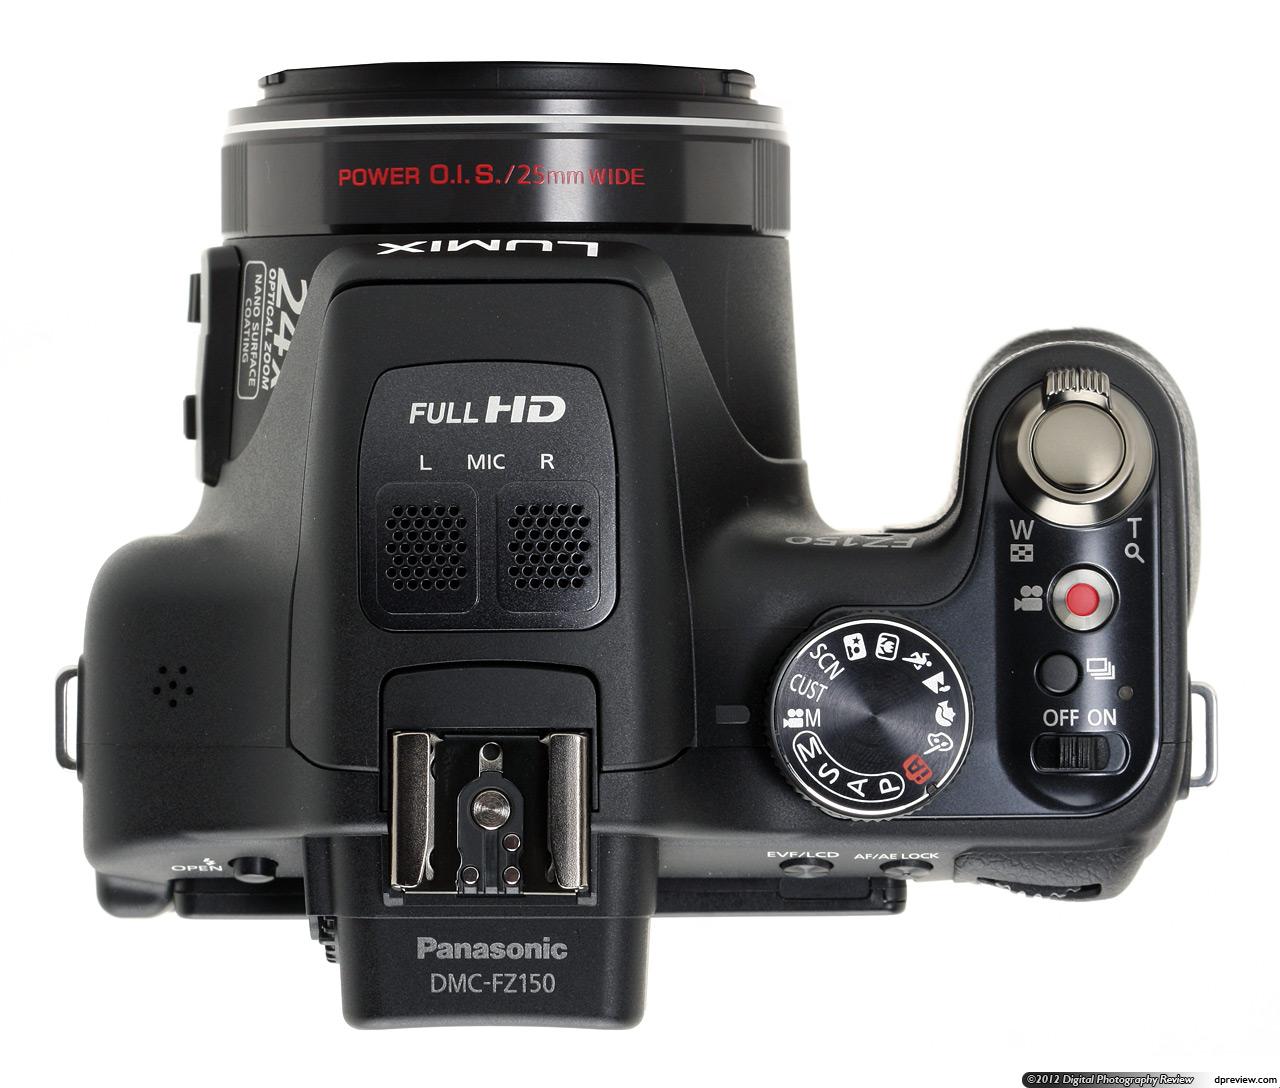 panasonic lumix dmc fz150 review digital photography review rh dpreview com panasonic fz150 manual panasonic fz150 manual